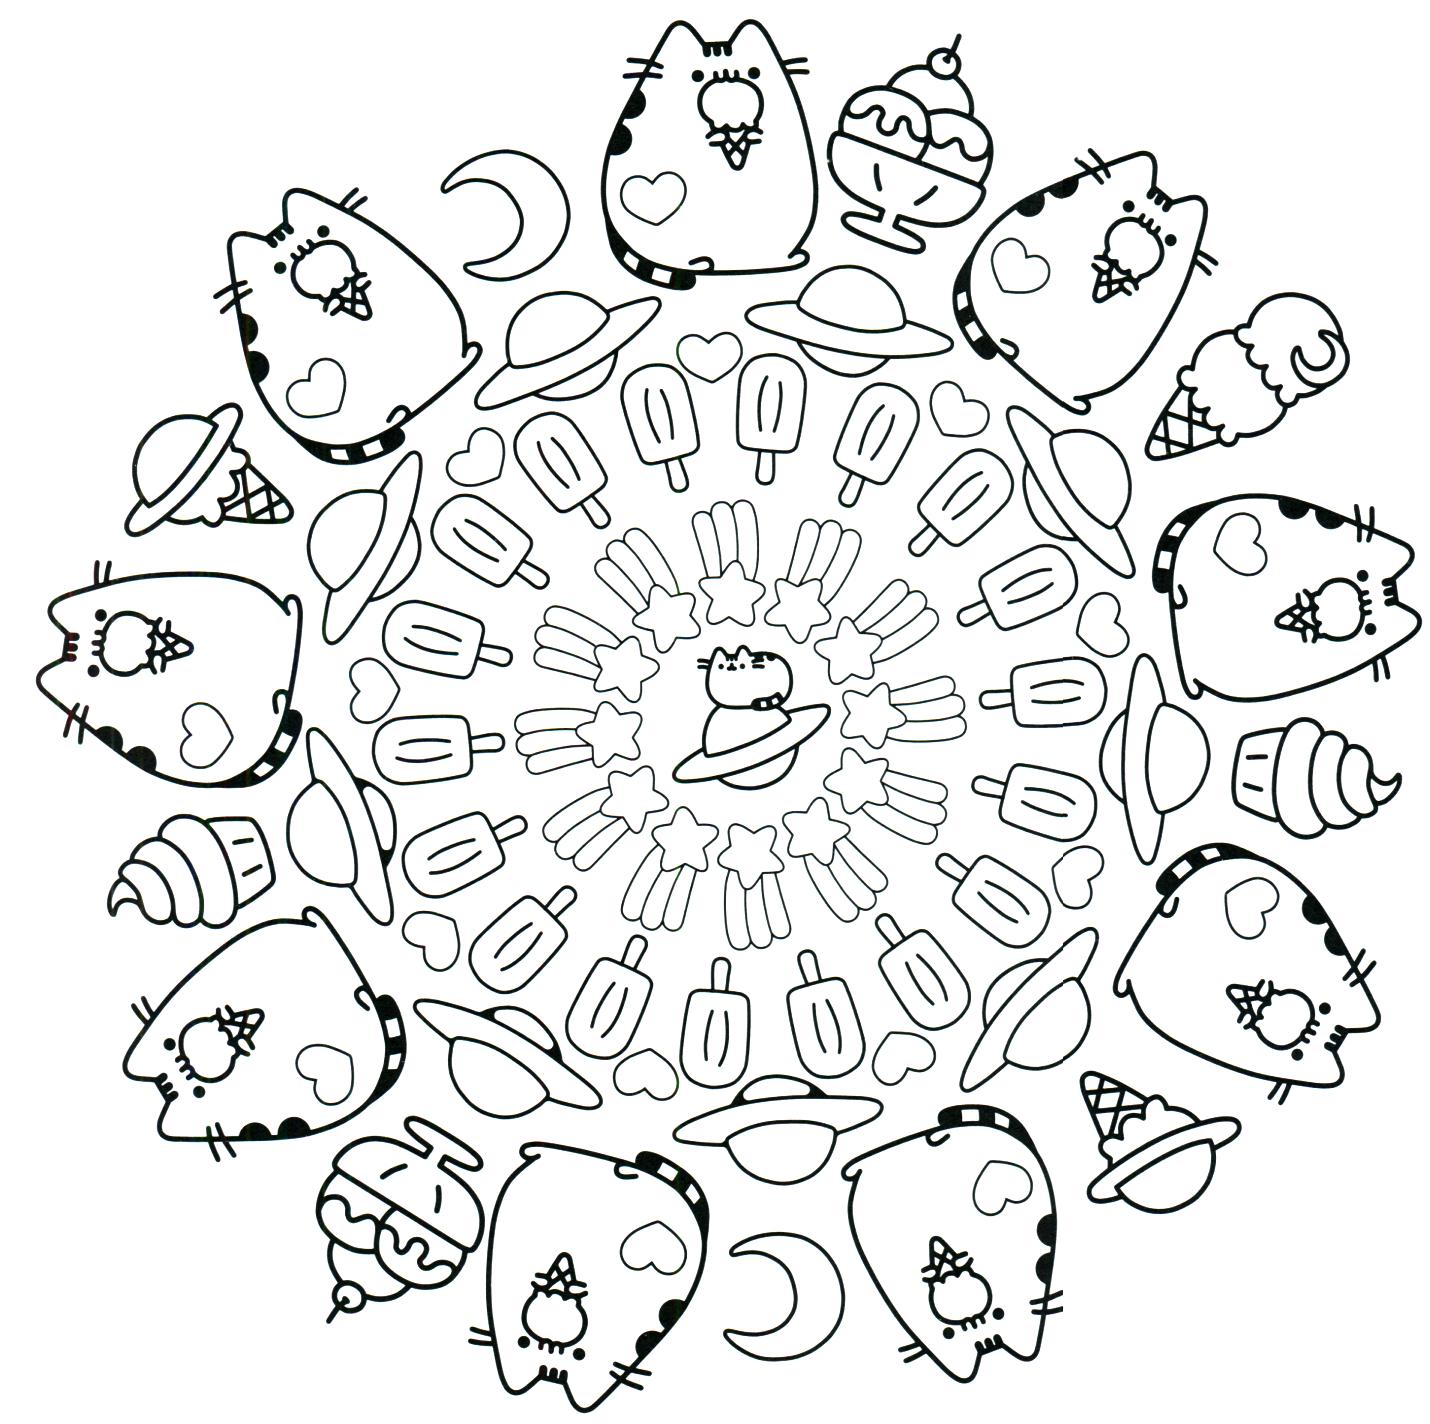 Pusheen Coloring Book Pusheen Pusheen the Cat | coloring | Pinterest ...